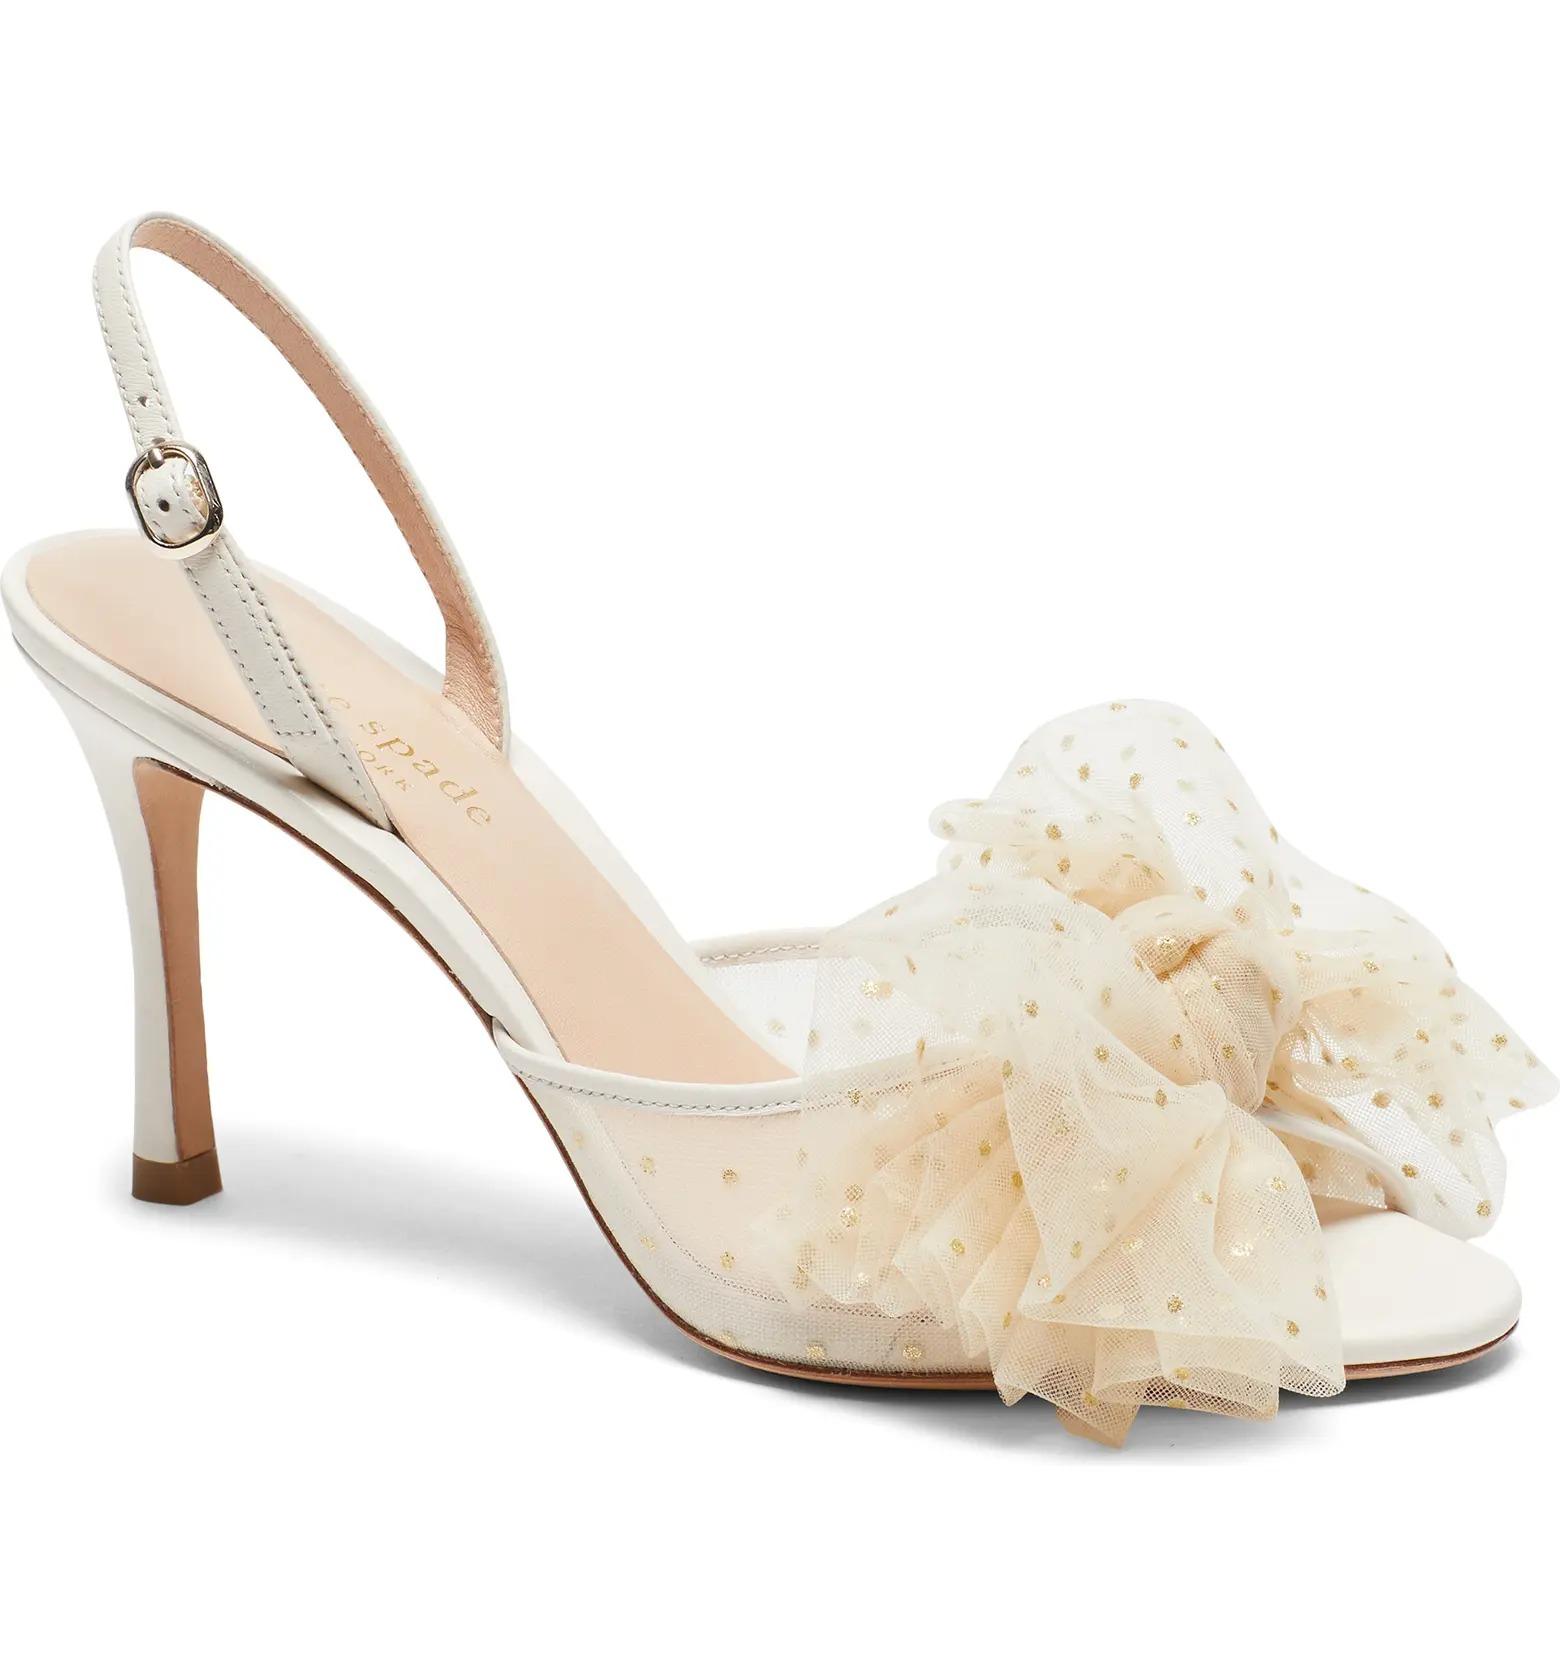 gold dotted bowtie slingback Kate Spade sandal heel wedding shoes at Nordstrom